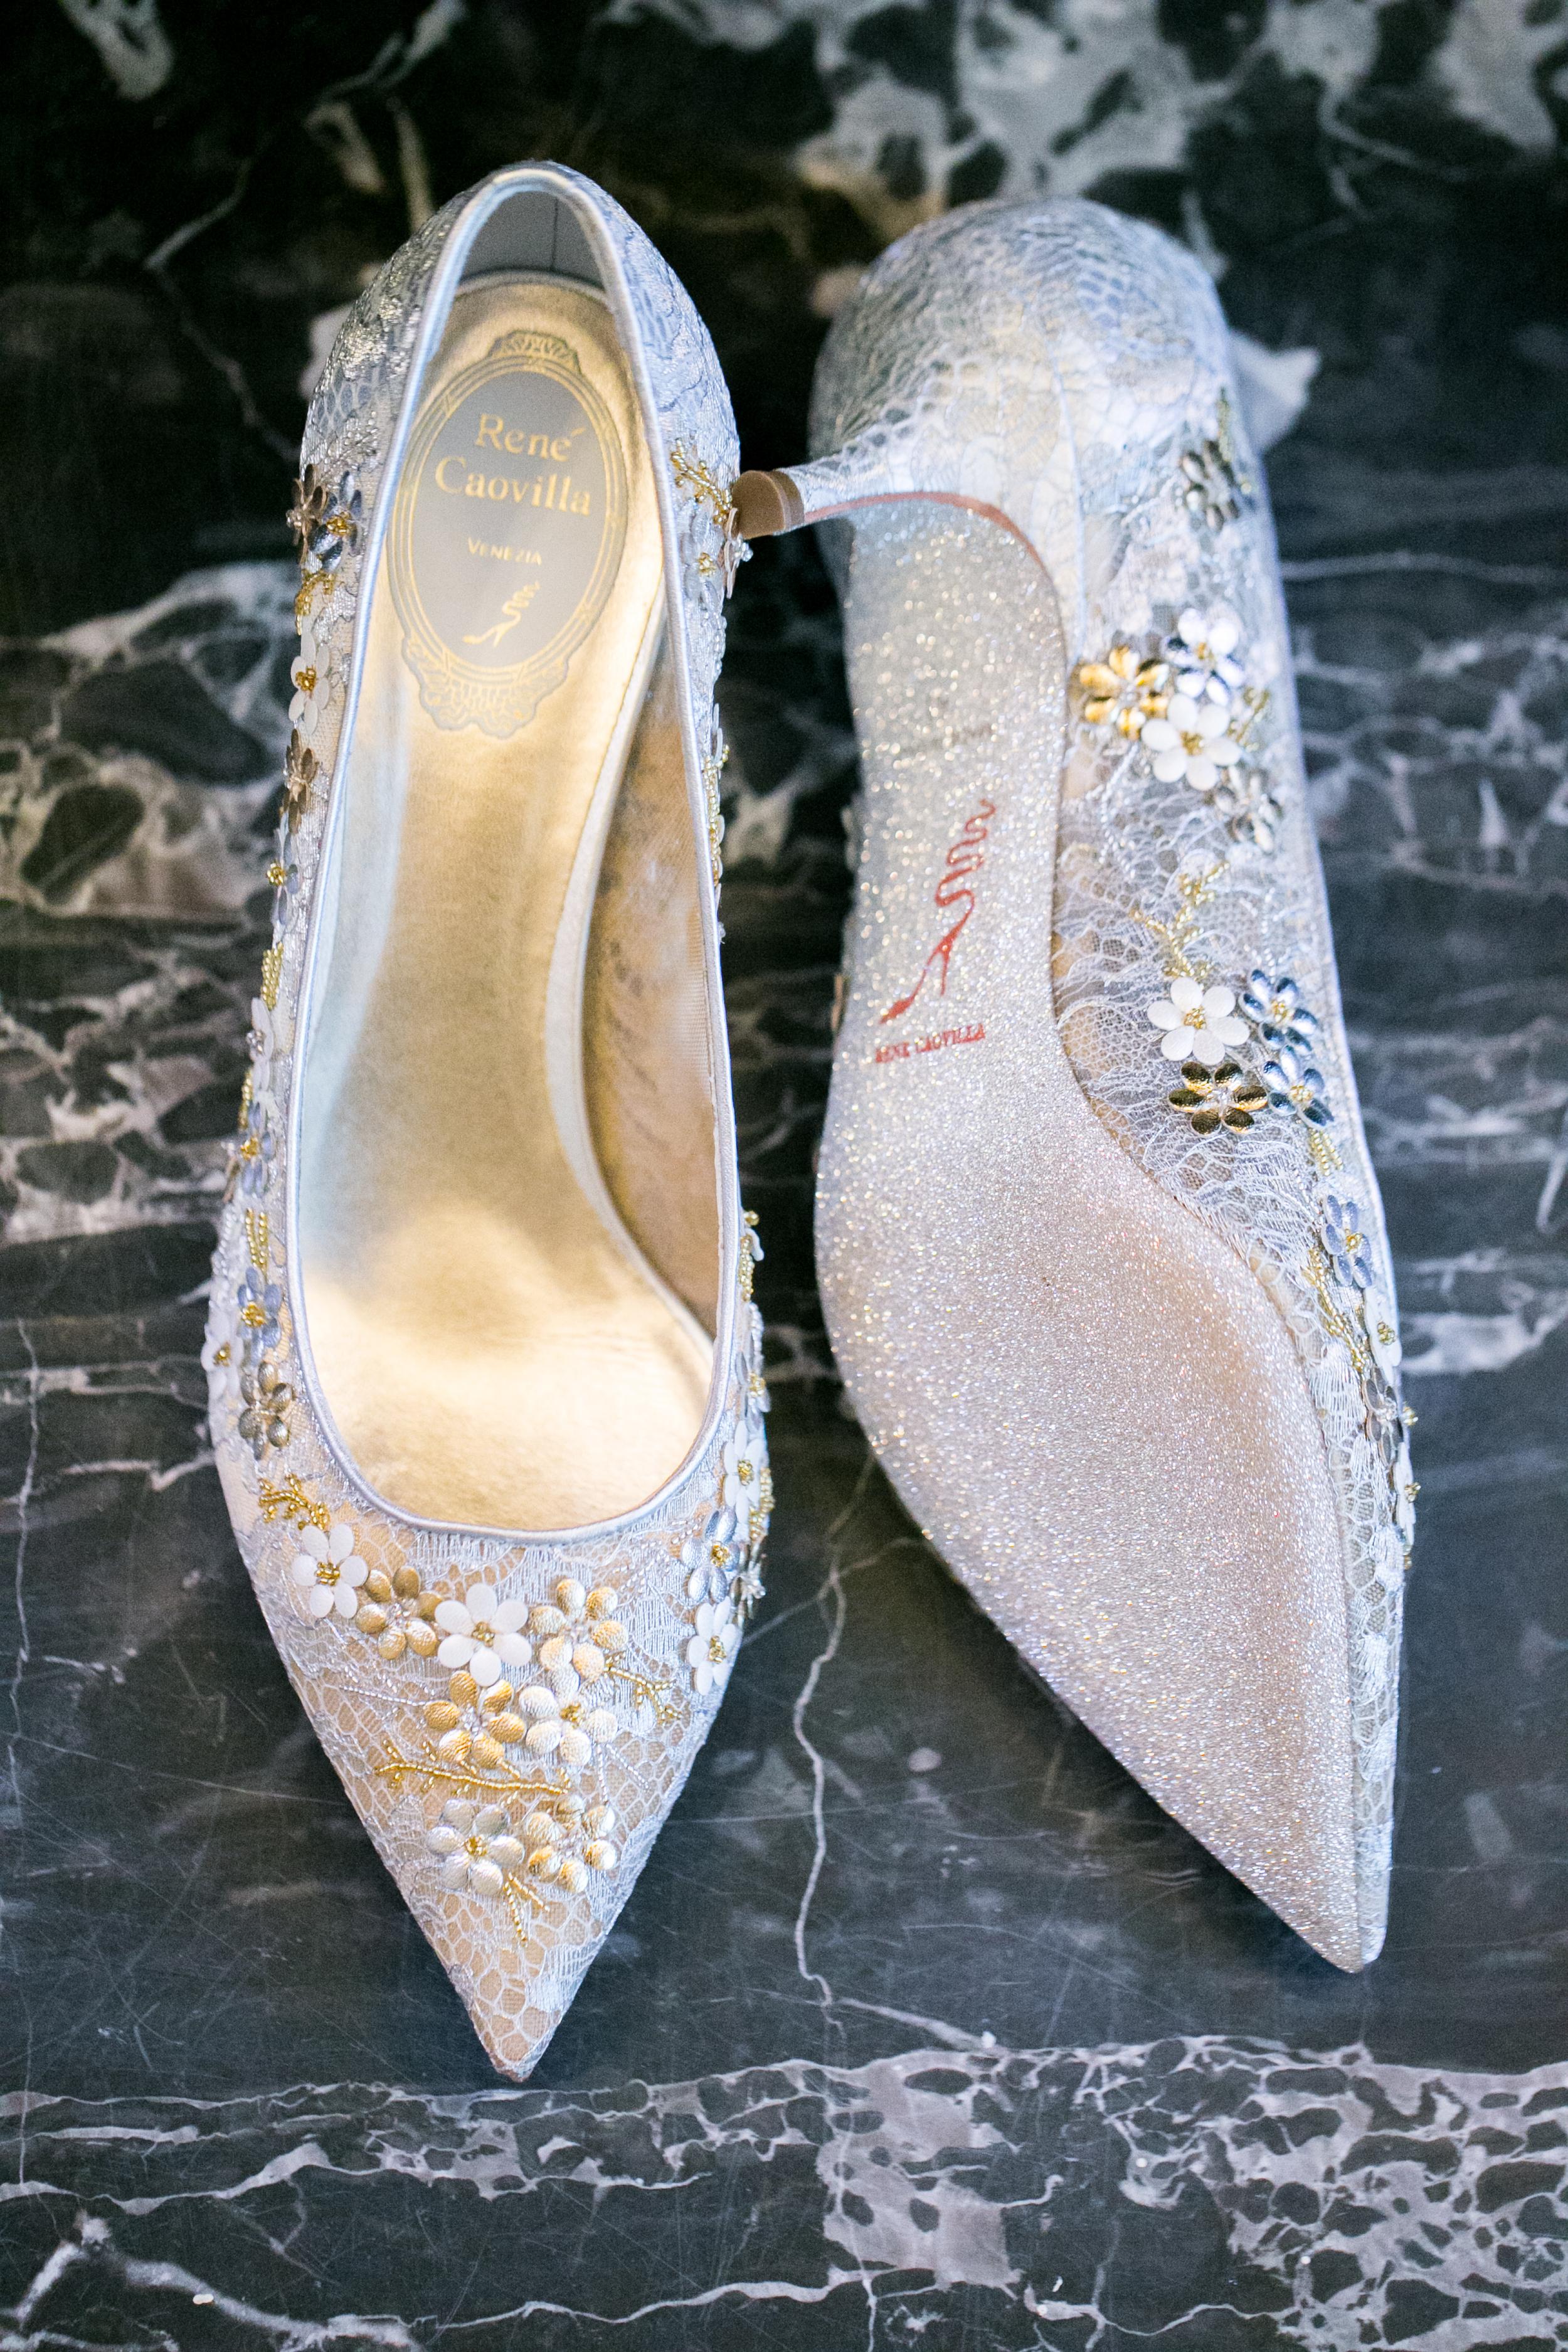 NYC-Wedding-Planner-Andrea-Freeman-Events-Leob-Boathouse-Central-Park-5.jpg